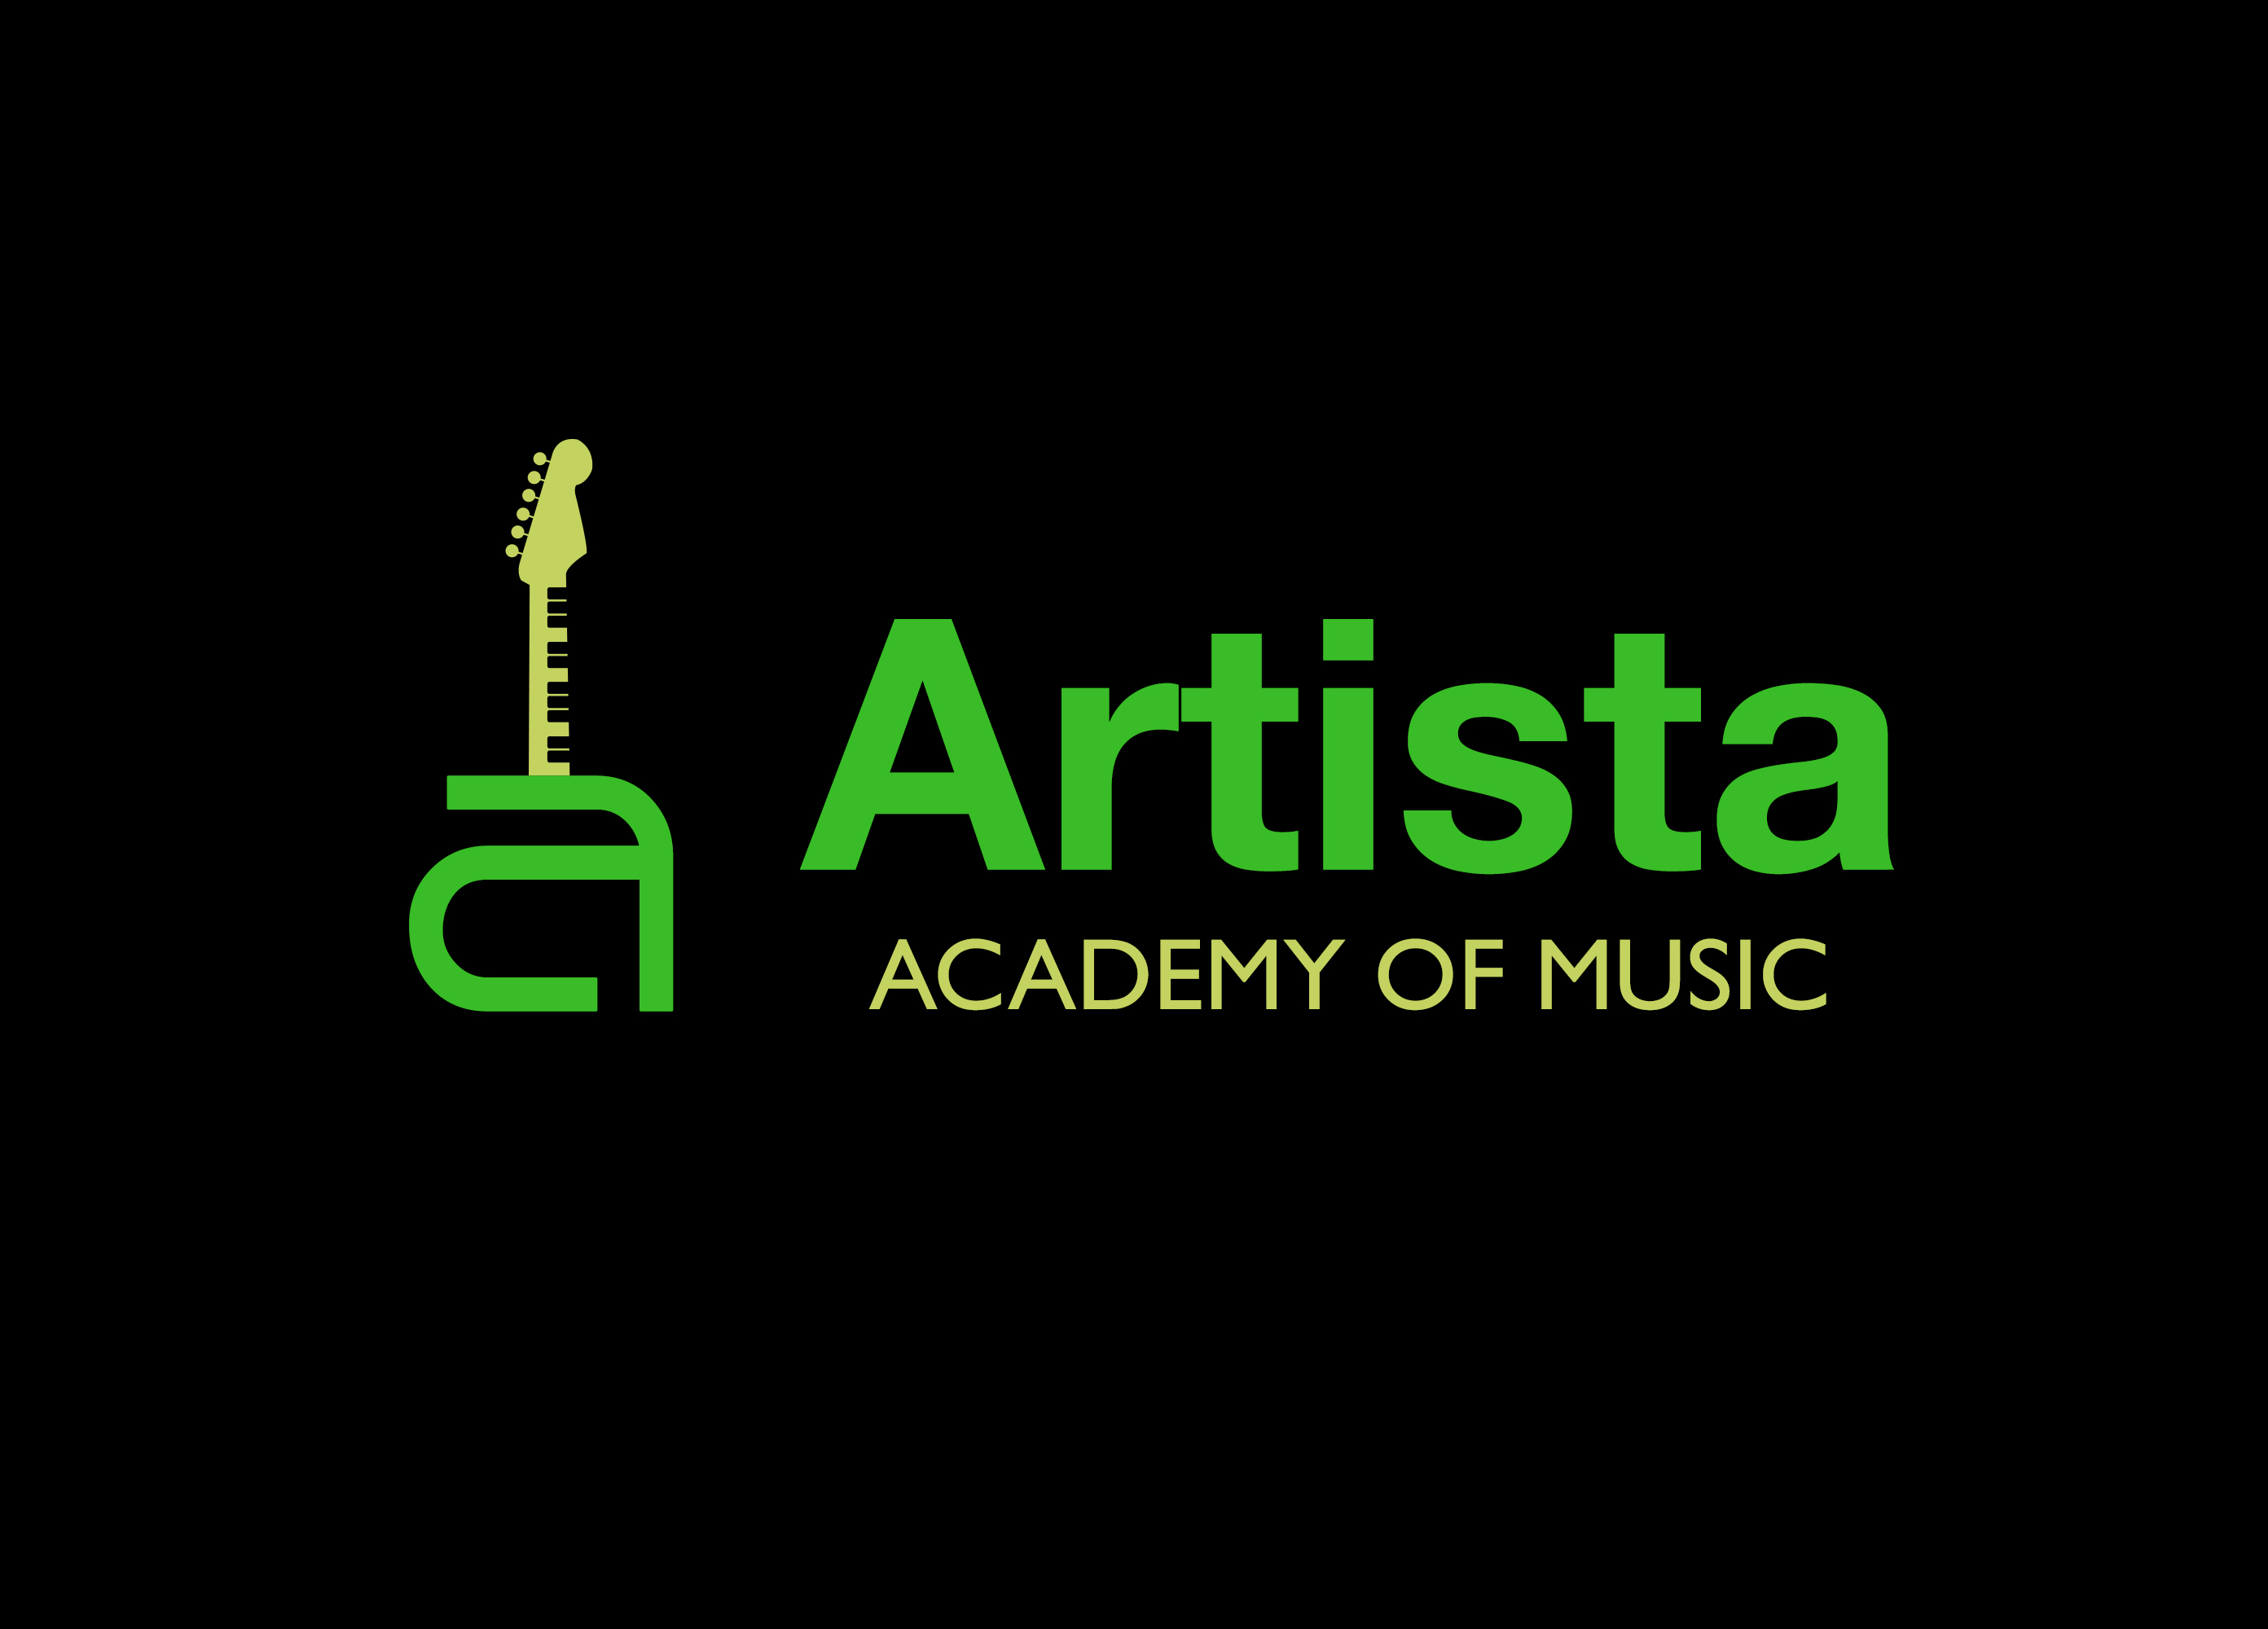 Artista Academy of Music